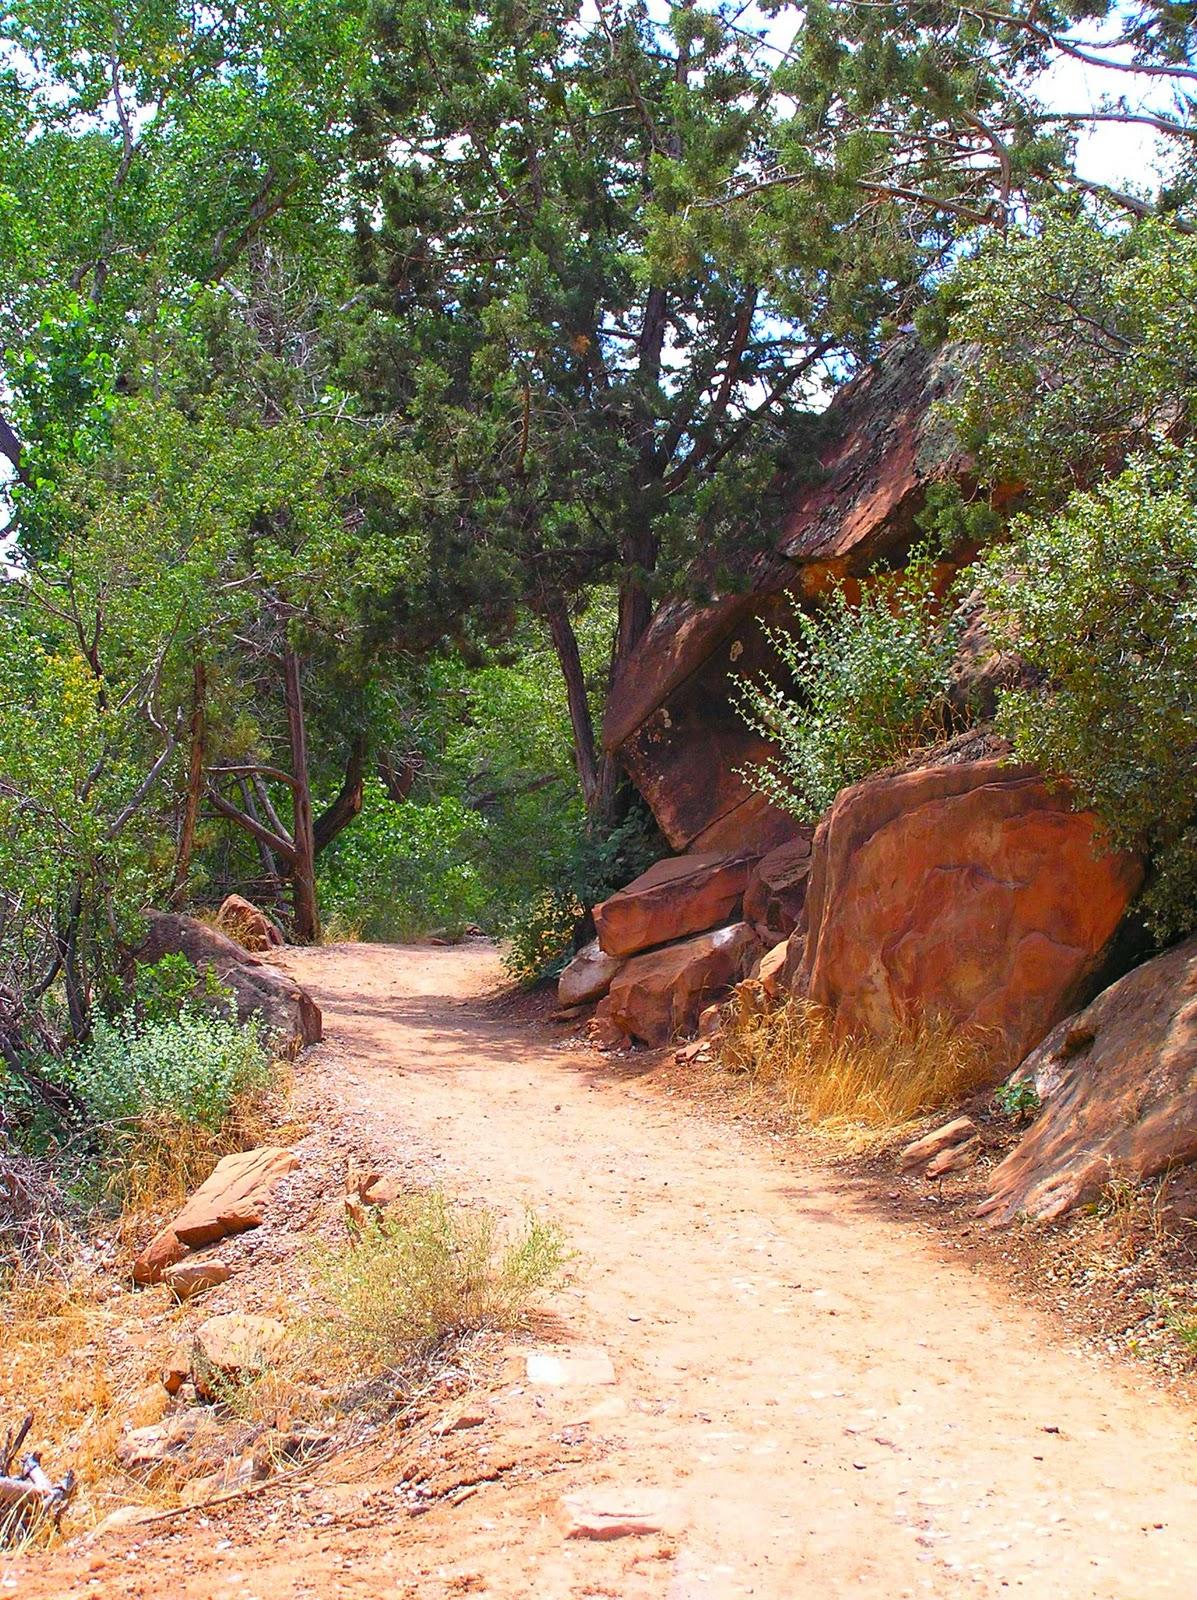 Zion National Park Quotes: Quotes About Zion National Park. QuotesGram